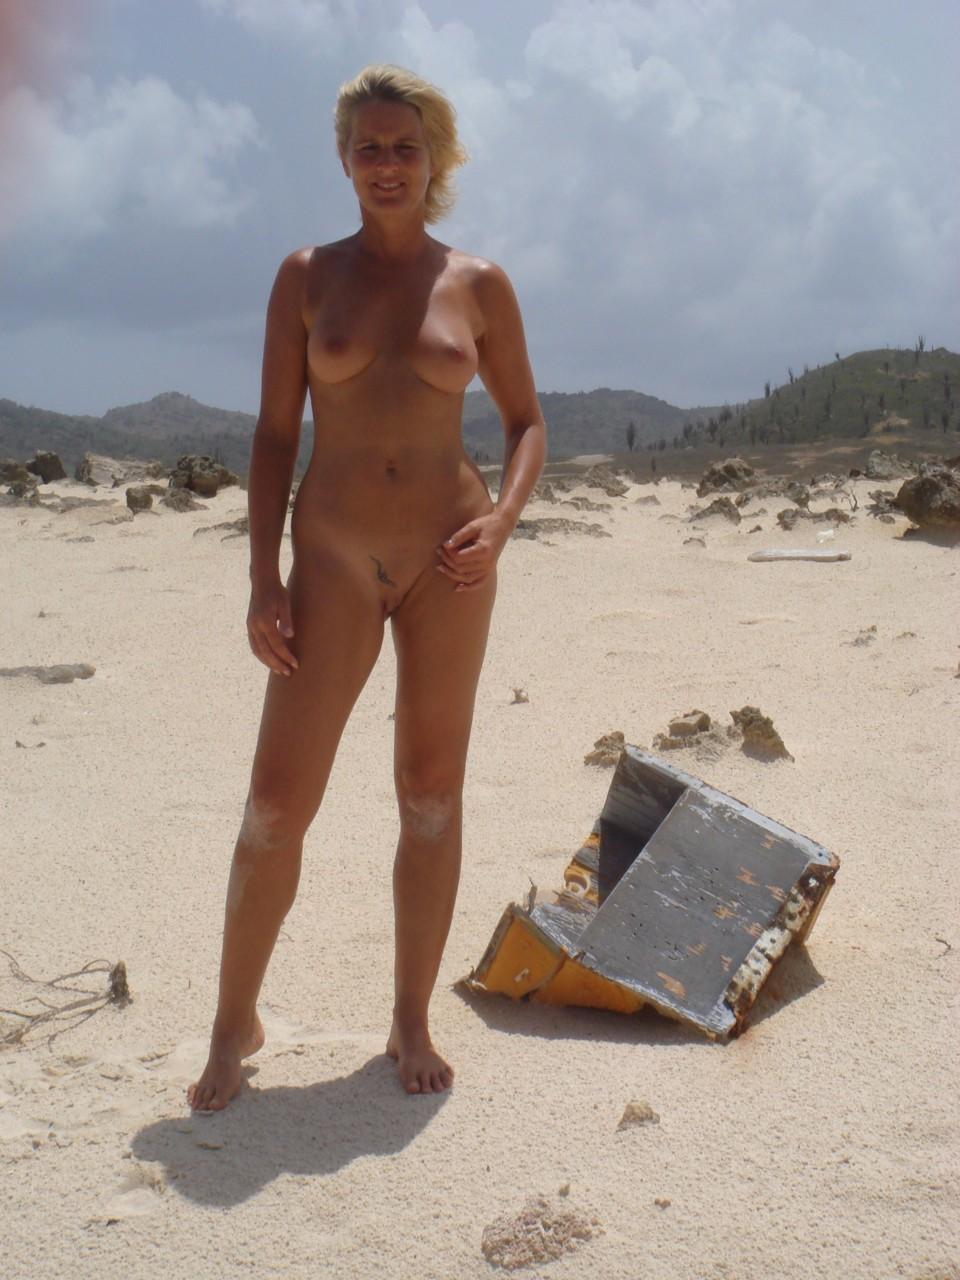 older nudist pics older woman photo nudist lwm tnav qfp nfo